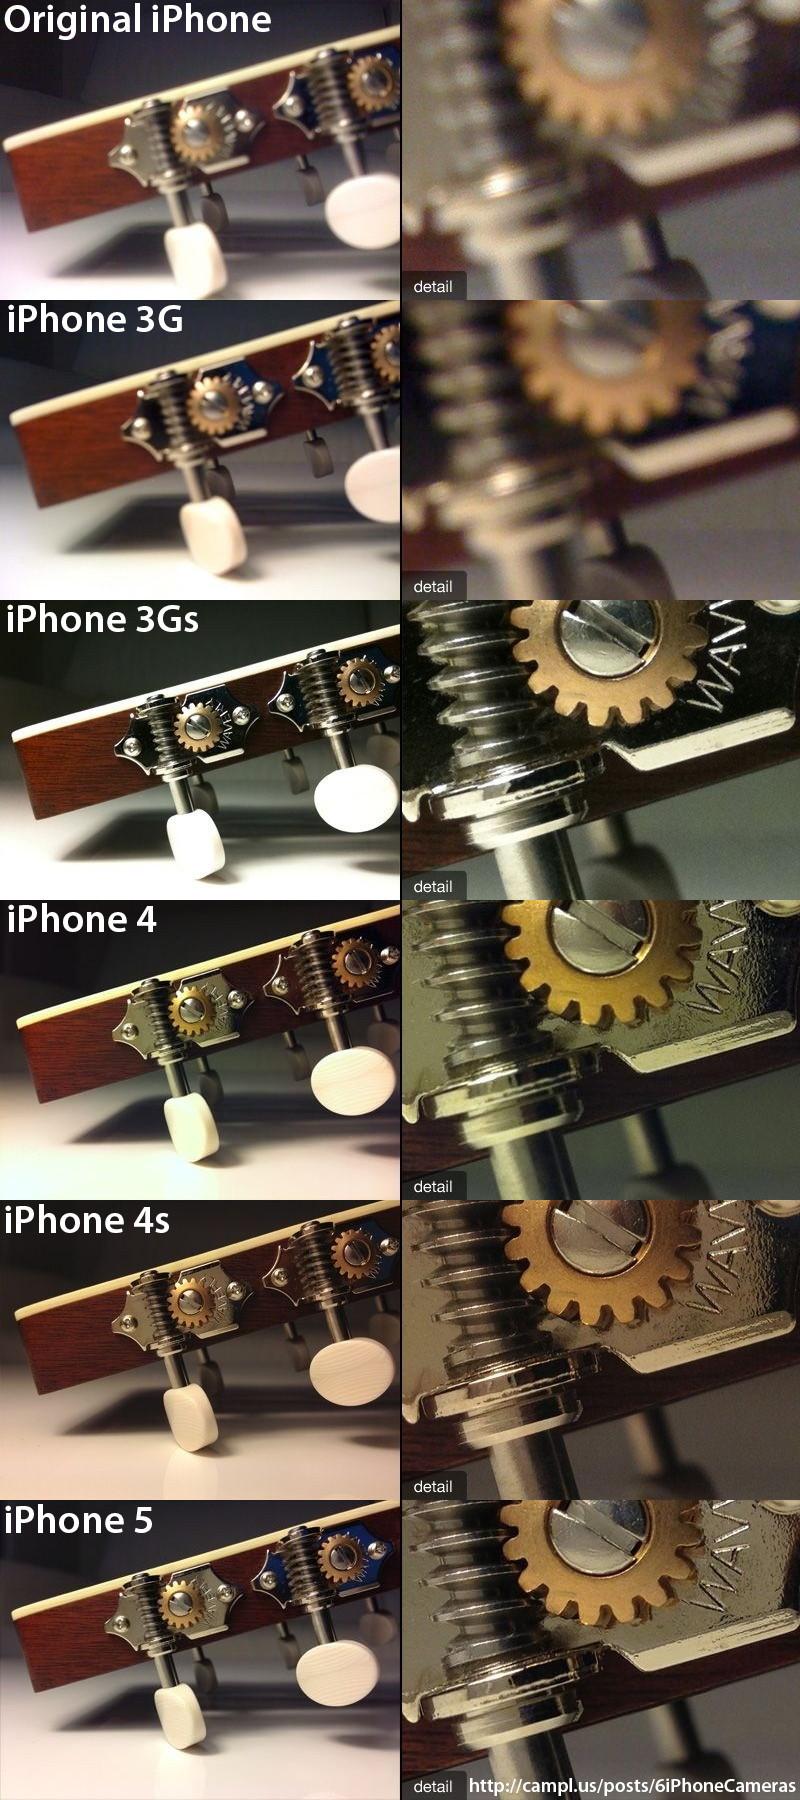 comparaison-photos-iphone-guitare